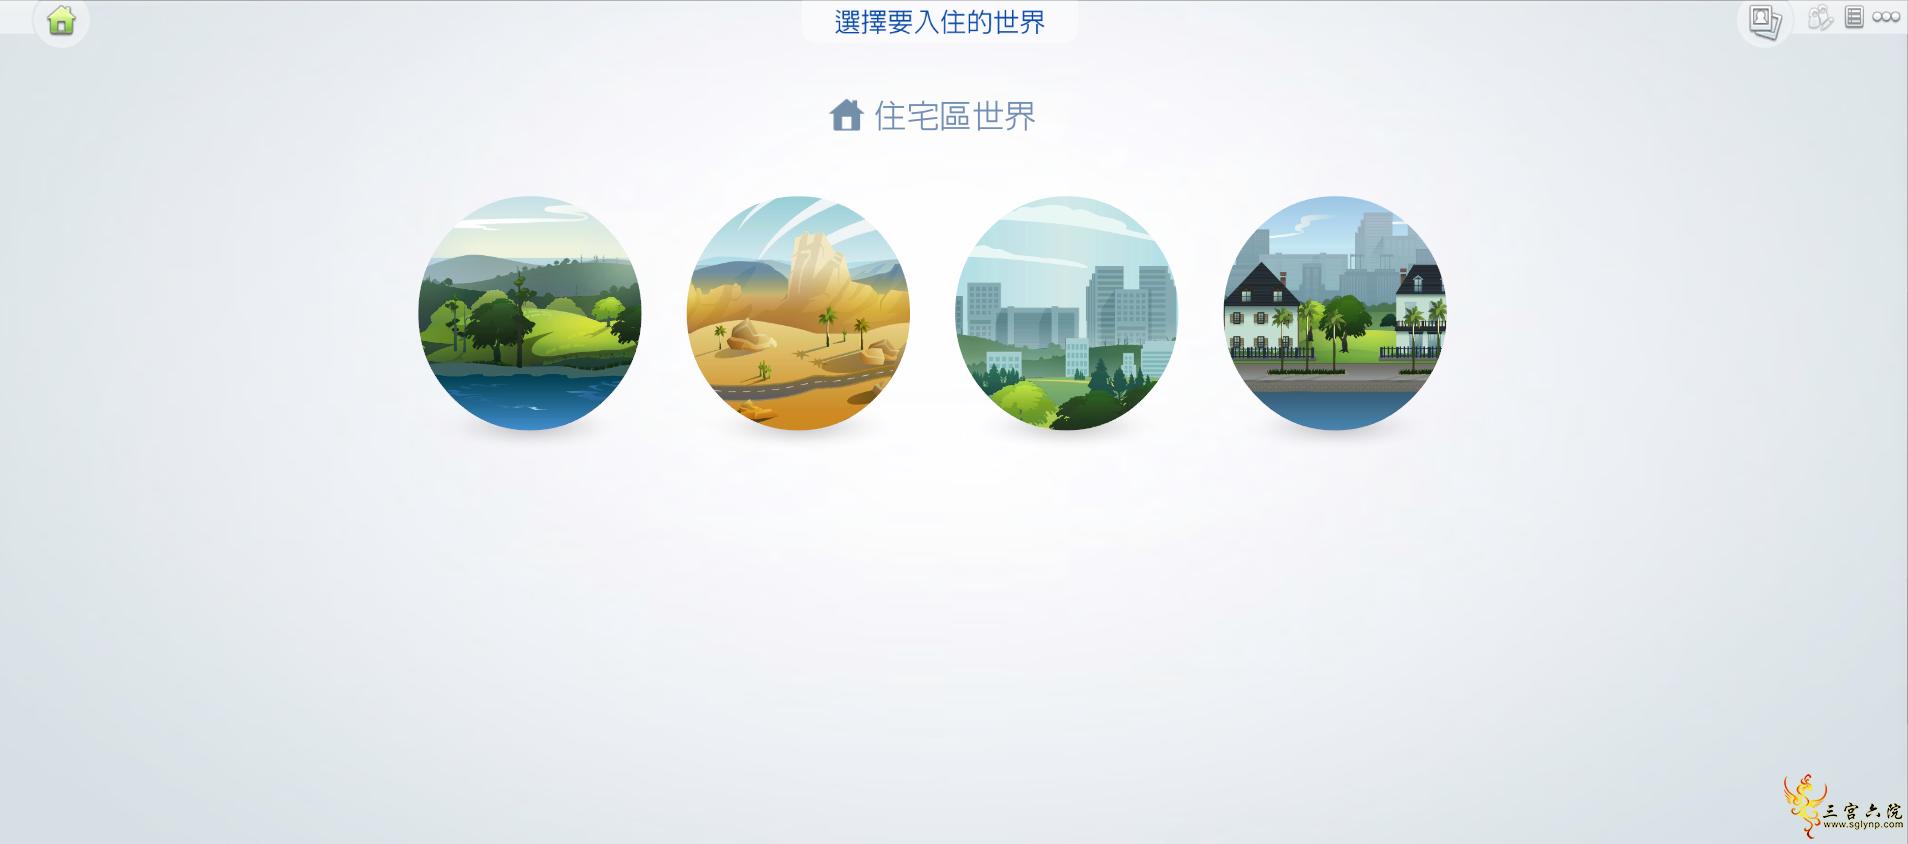 QQ图片20210703220603.png